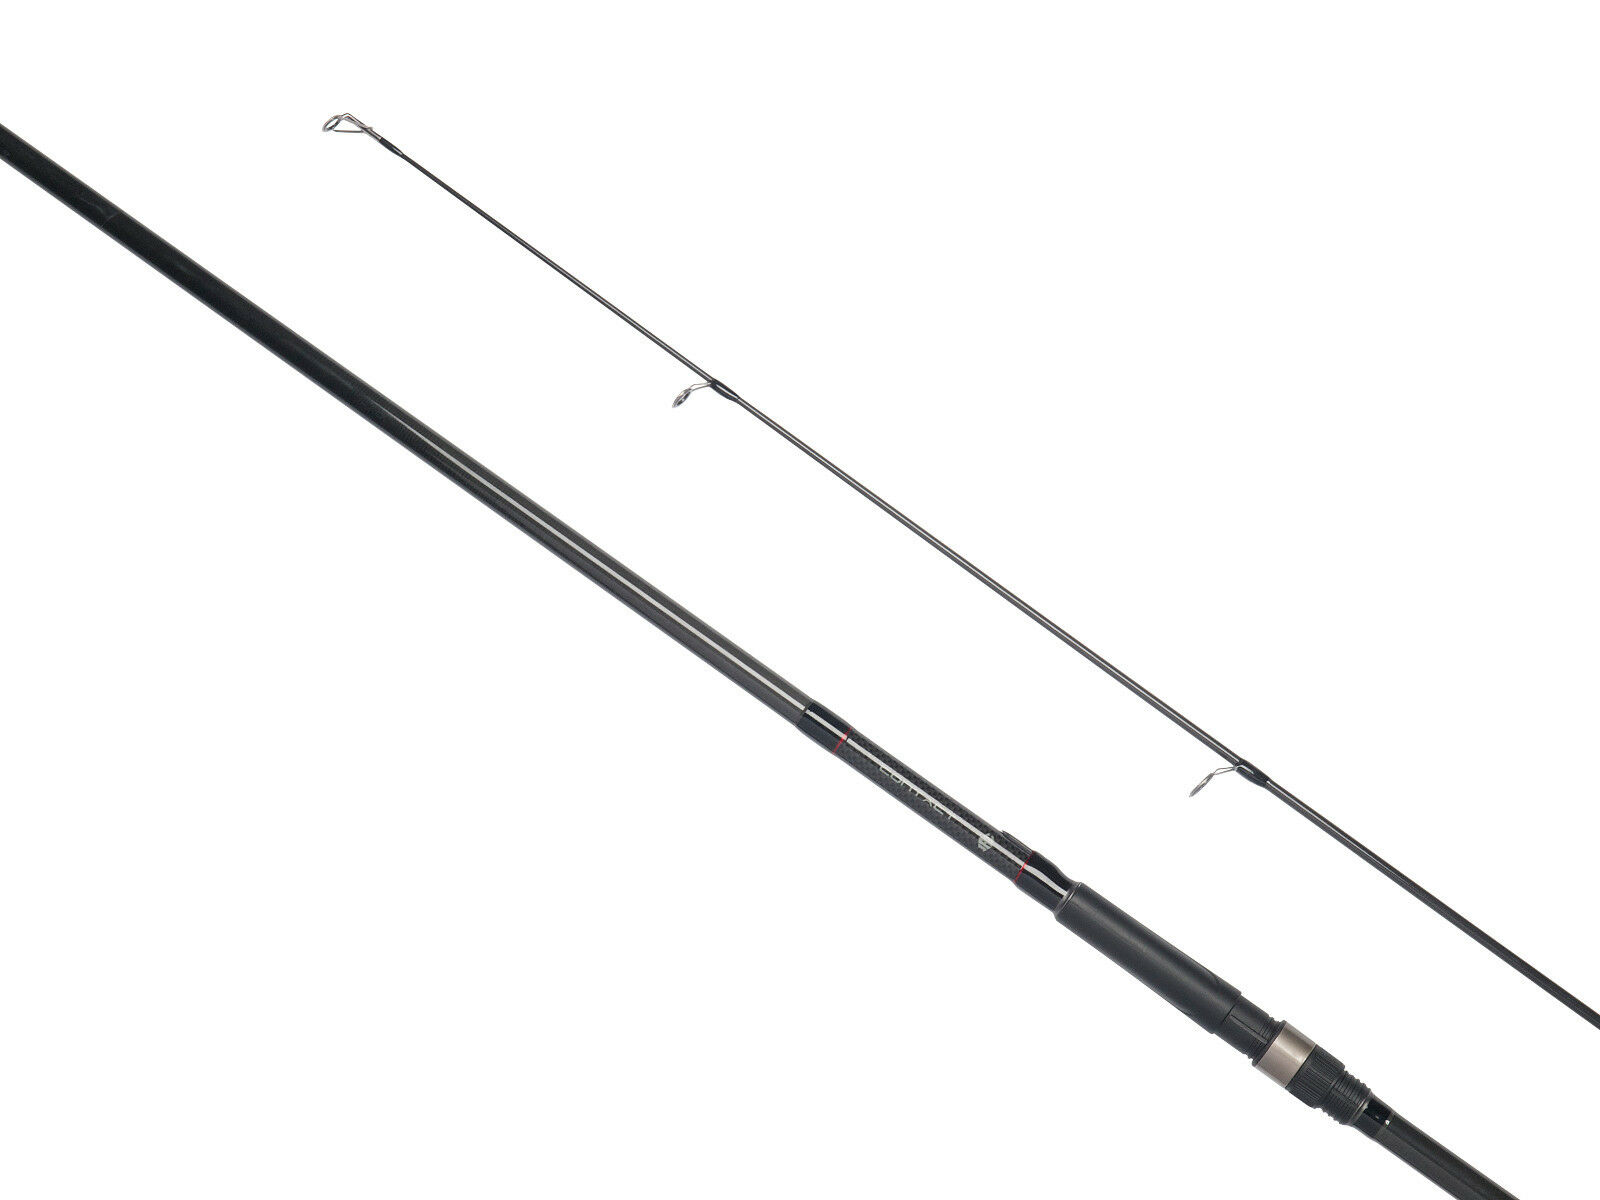 JRC Contact 13ft / 3,90m - 3,50lb - Karpfenrute